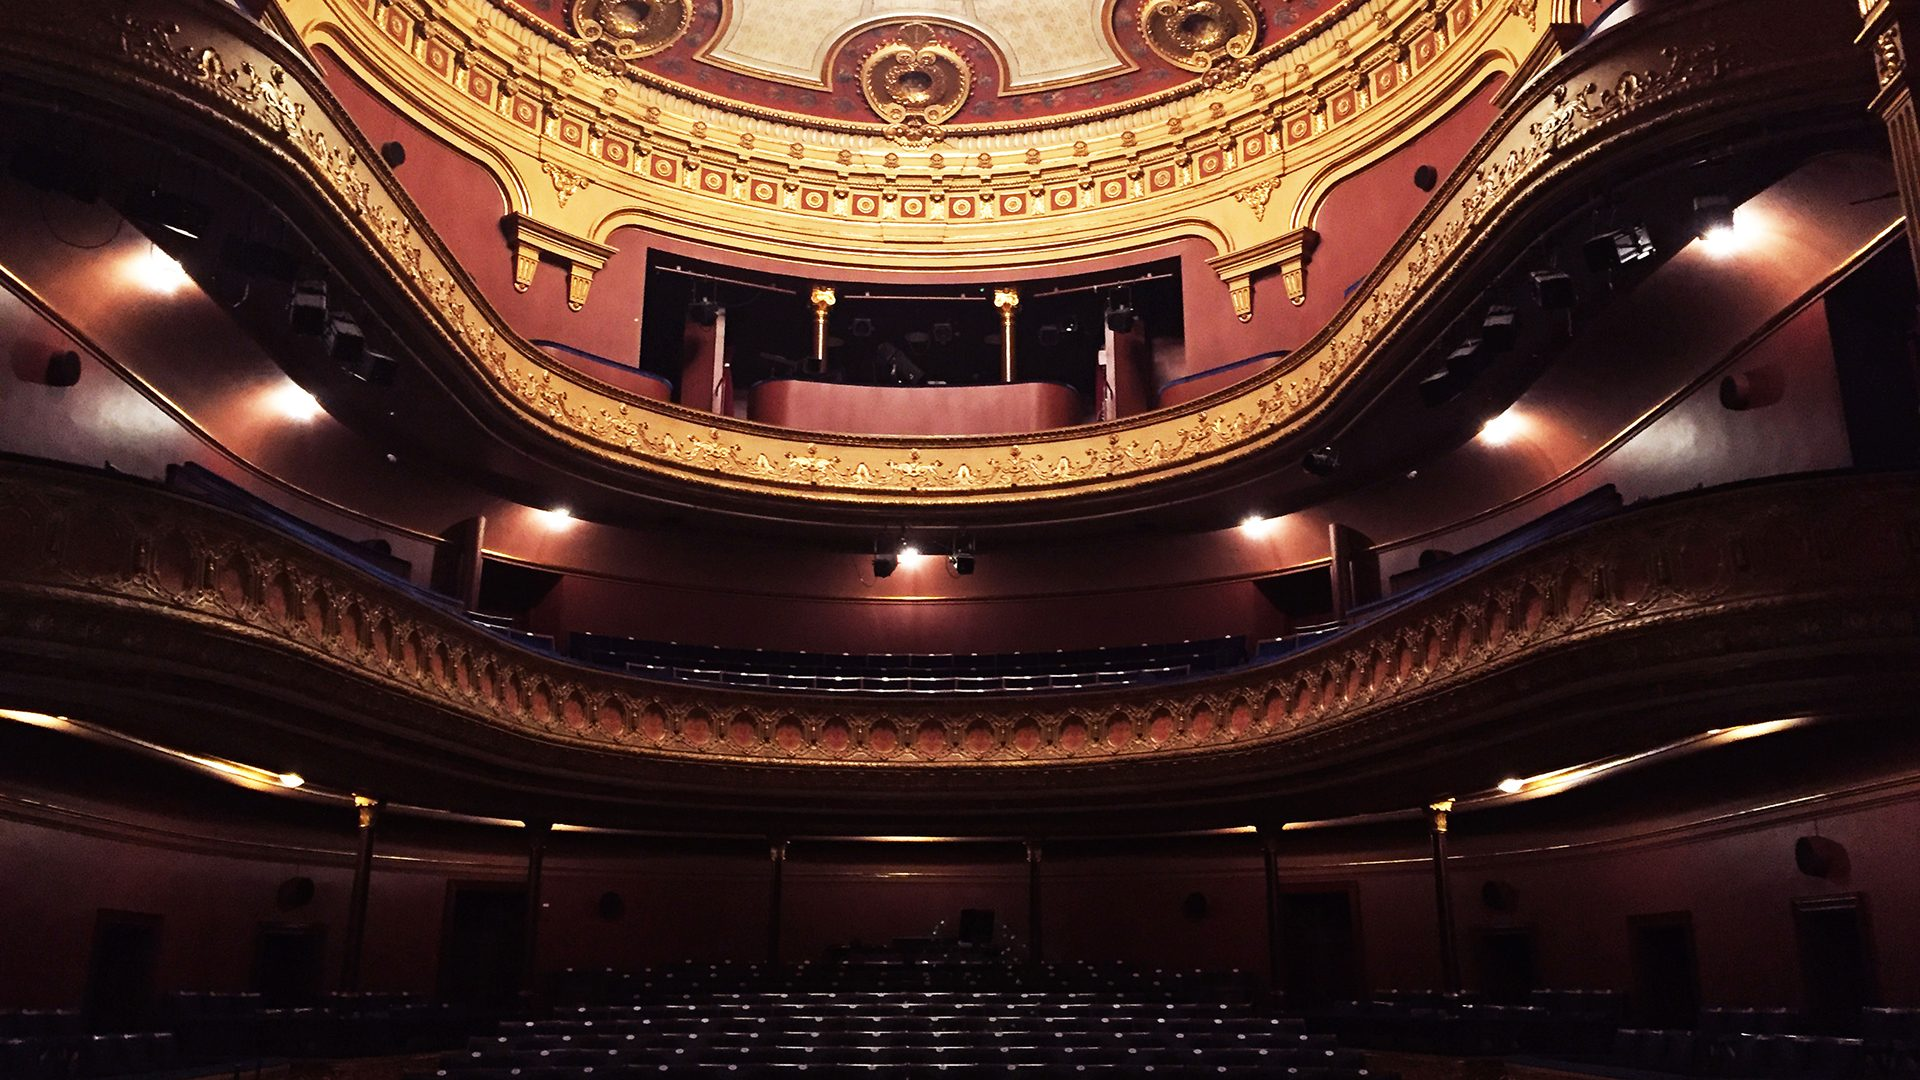 Gävle Teater insida 1920×1080